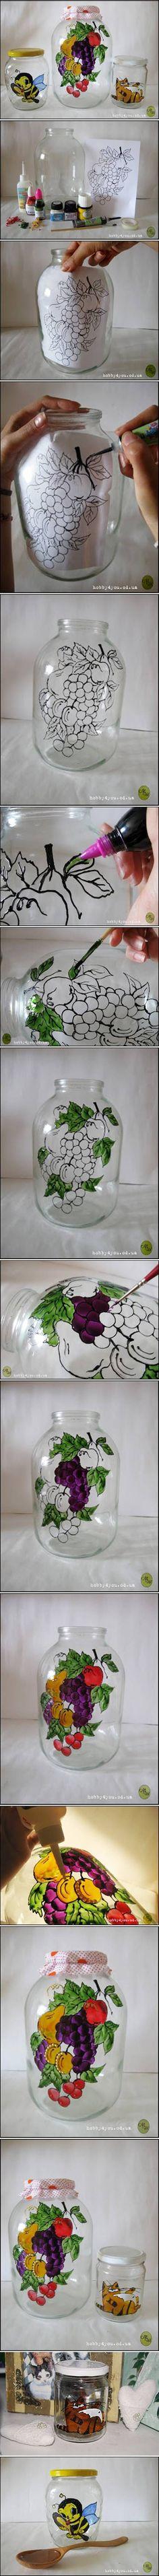 DIY Jar Painting - innovative concept!